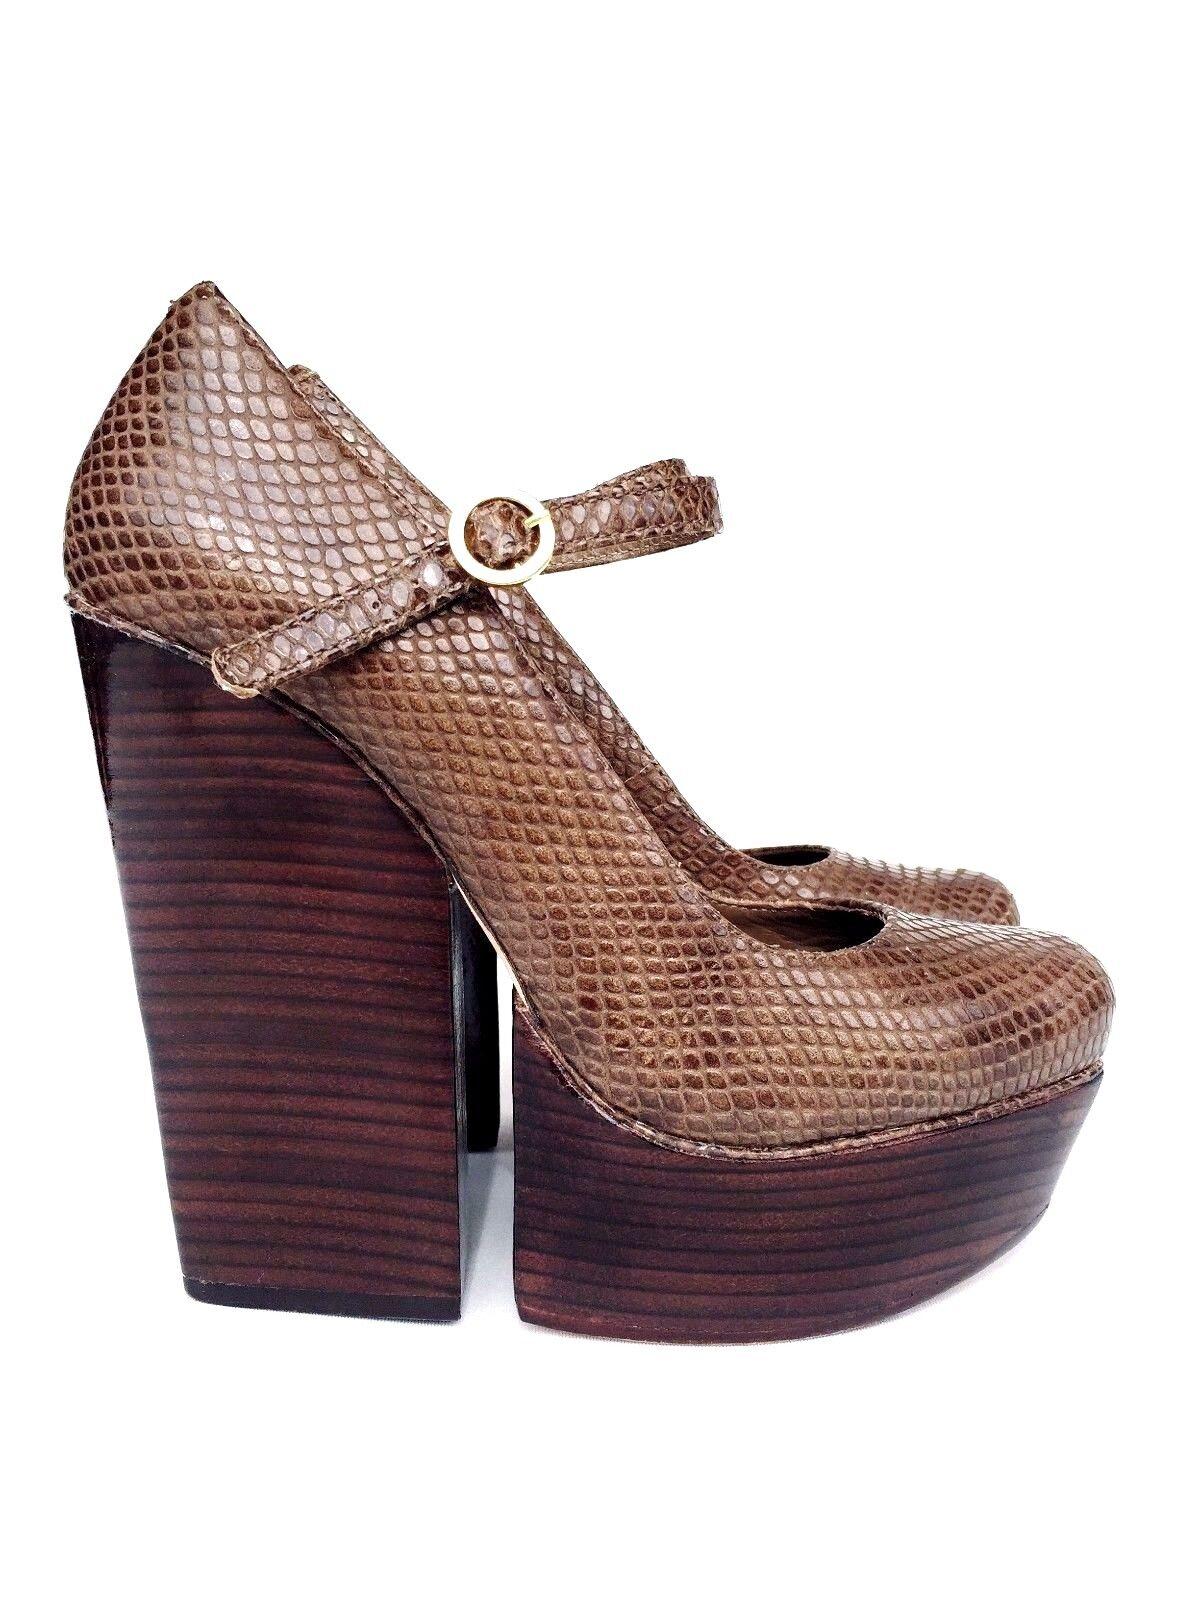 Alice & Olivia Olivia Olivia Brown Snake Pelle Platform High Wedge Heels Ankle ... 7ba4f4